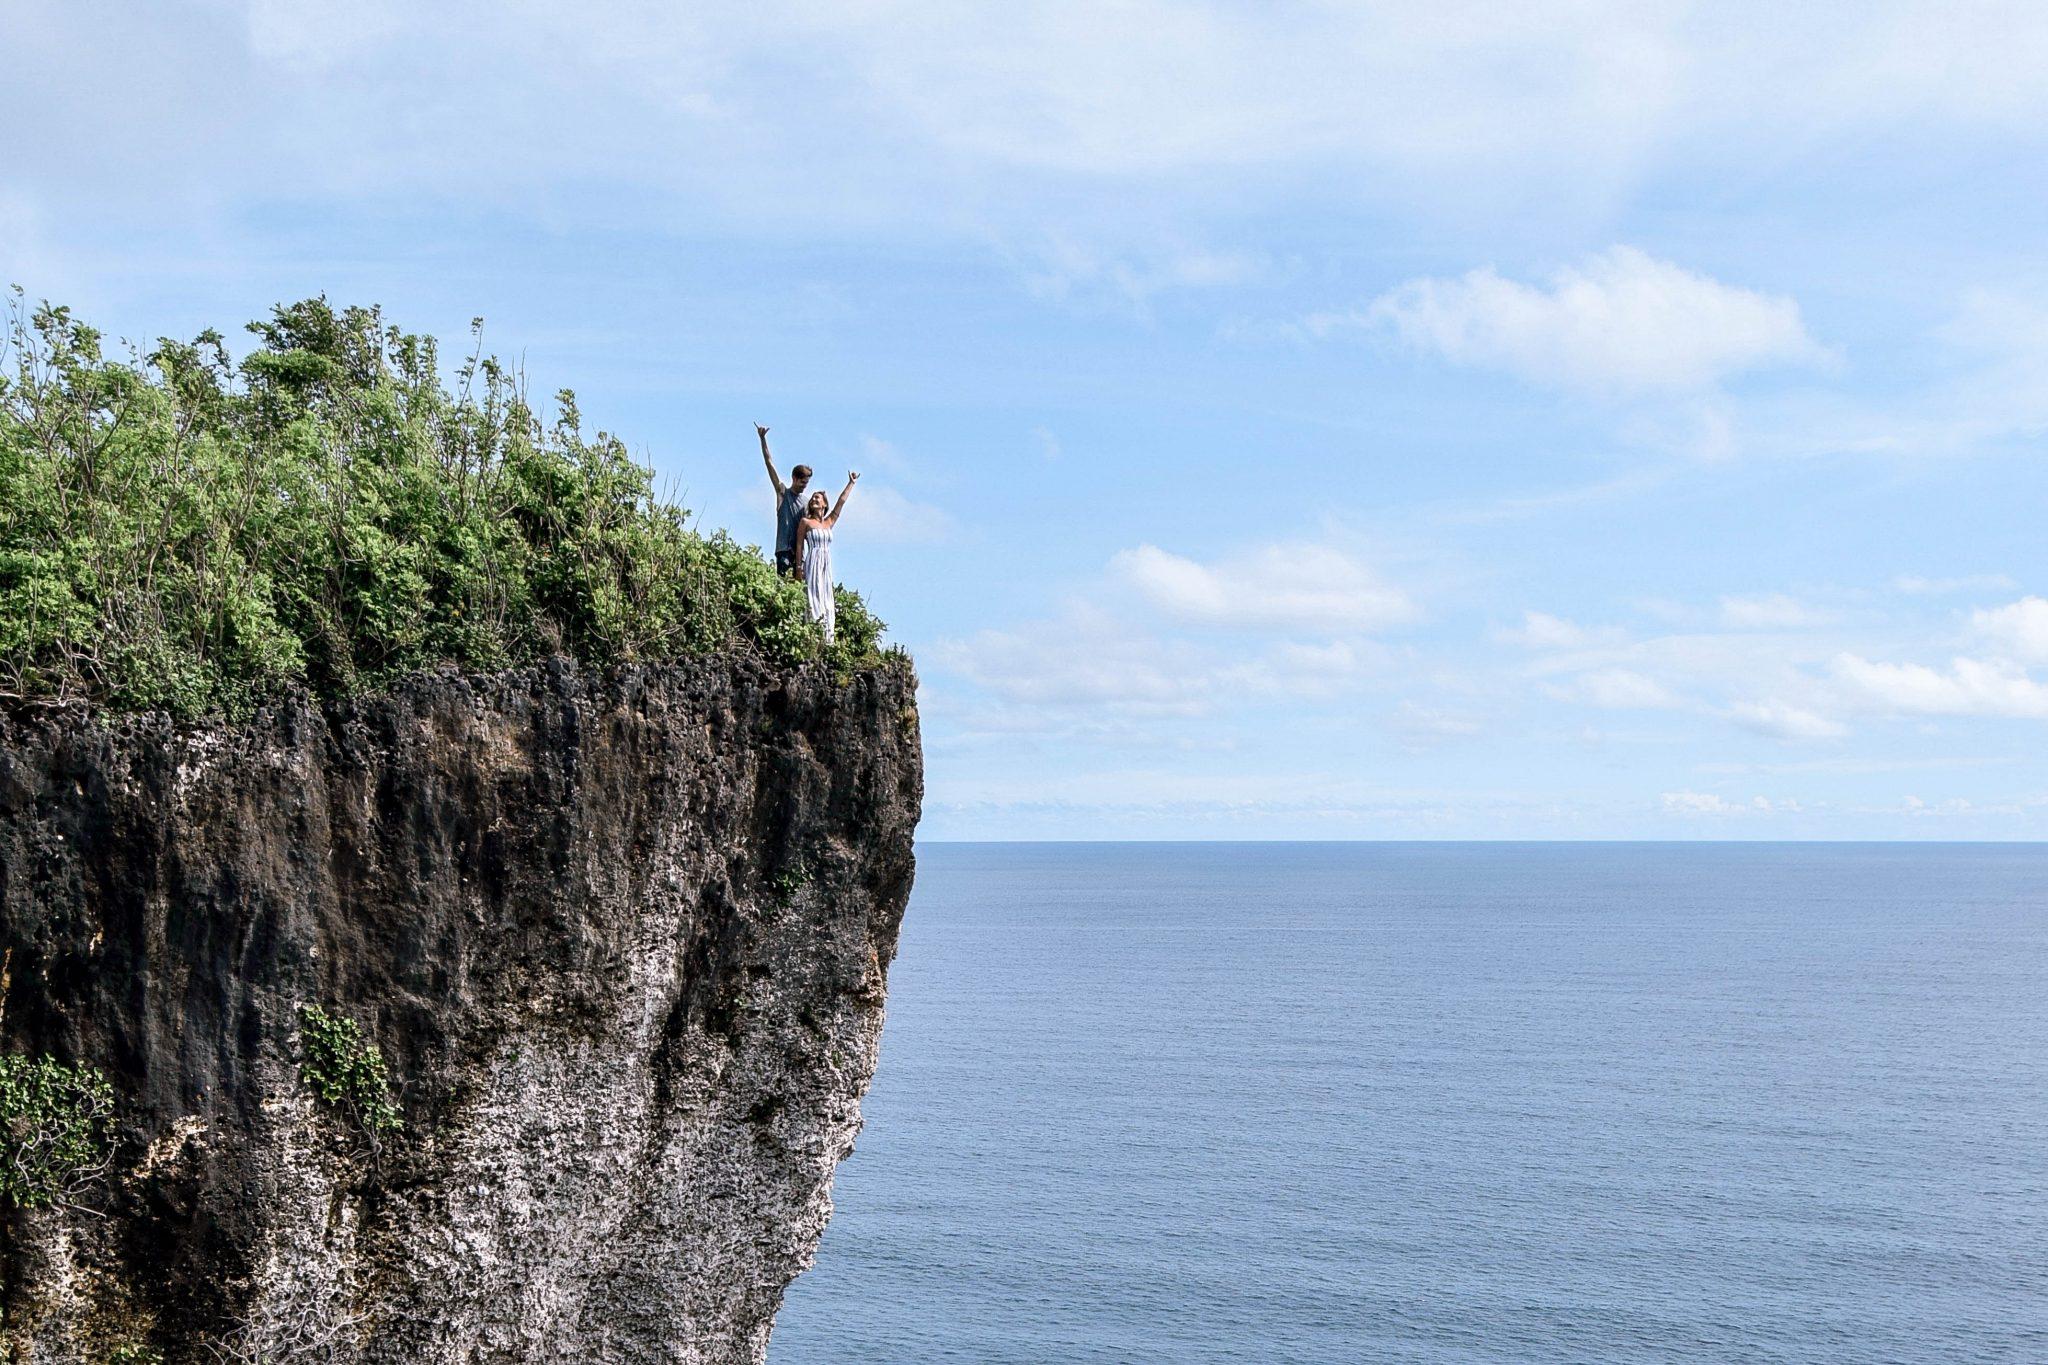 Wanderers & Warriors - Charlie & Lauren UK Travel Couple - Karang Boma Cliff – Uluwatu Cliff Spot Bali - Things to do in Uluwatu - bali cliff